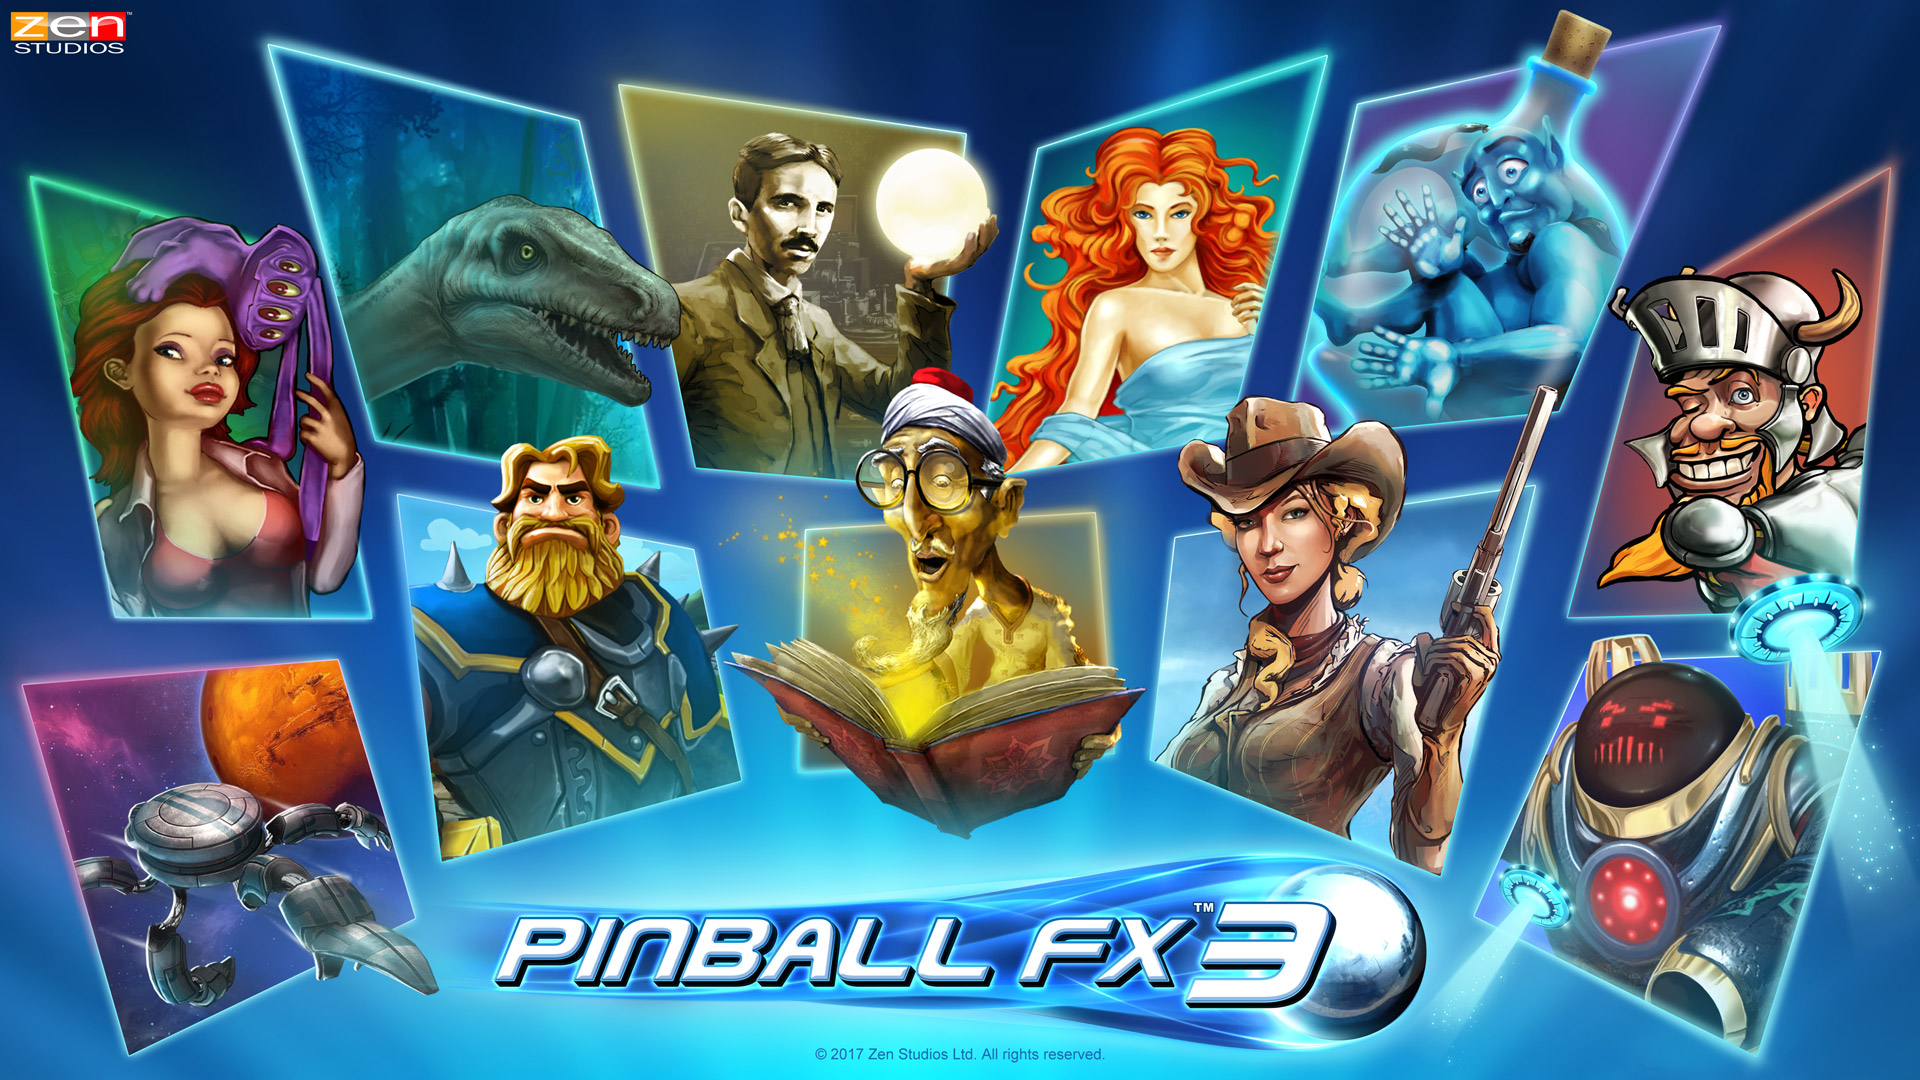 pinball-fx-3.jpg